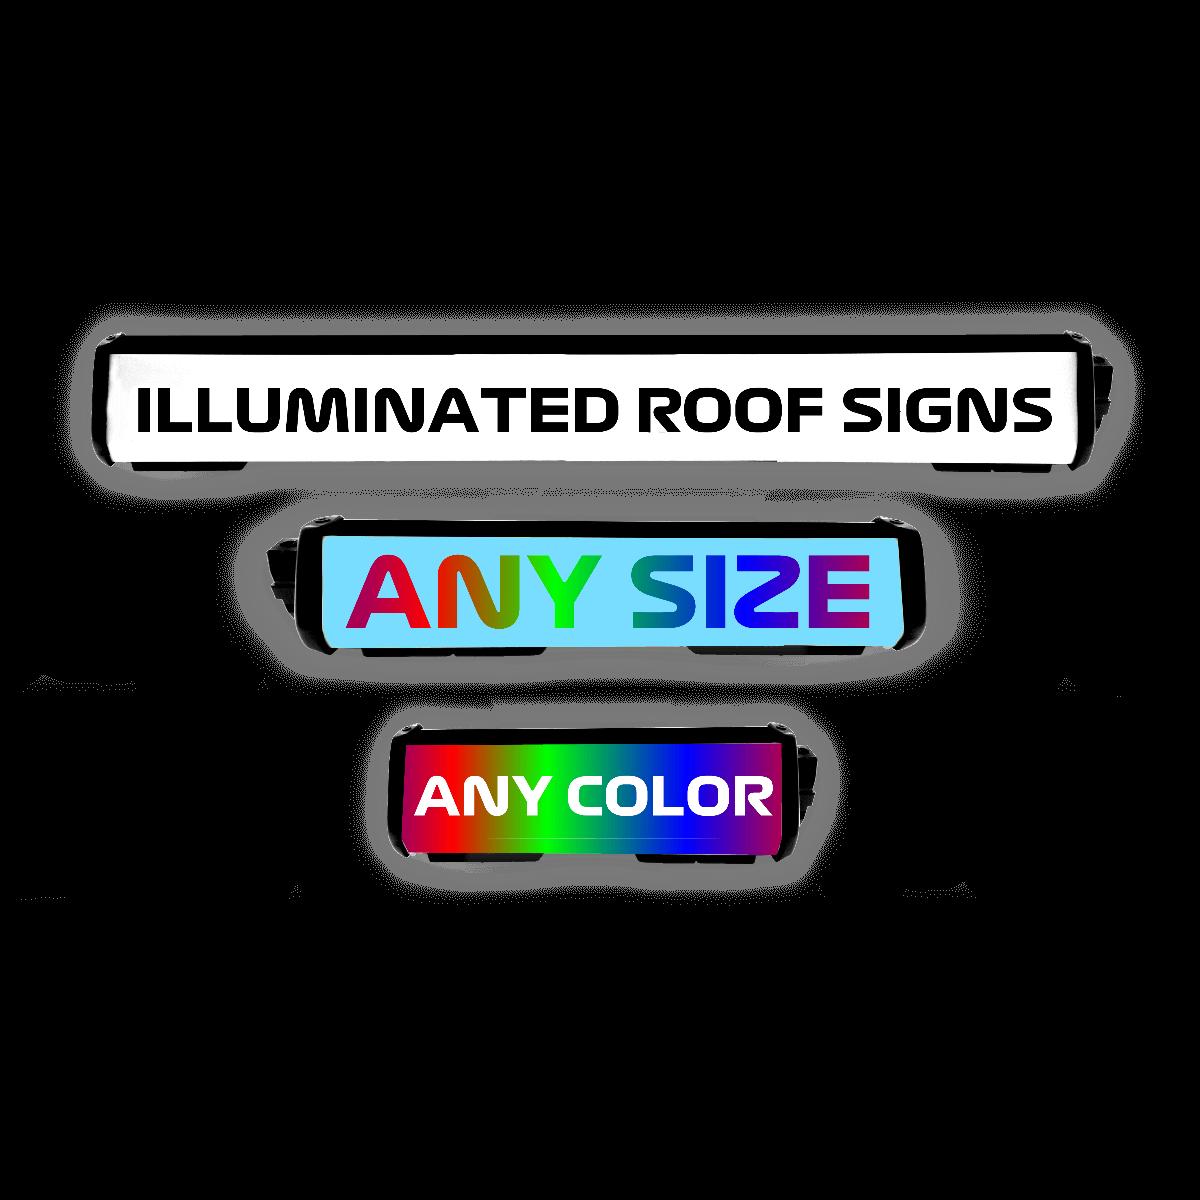 custom illuminated roof signs